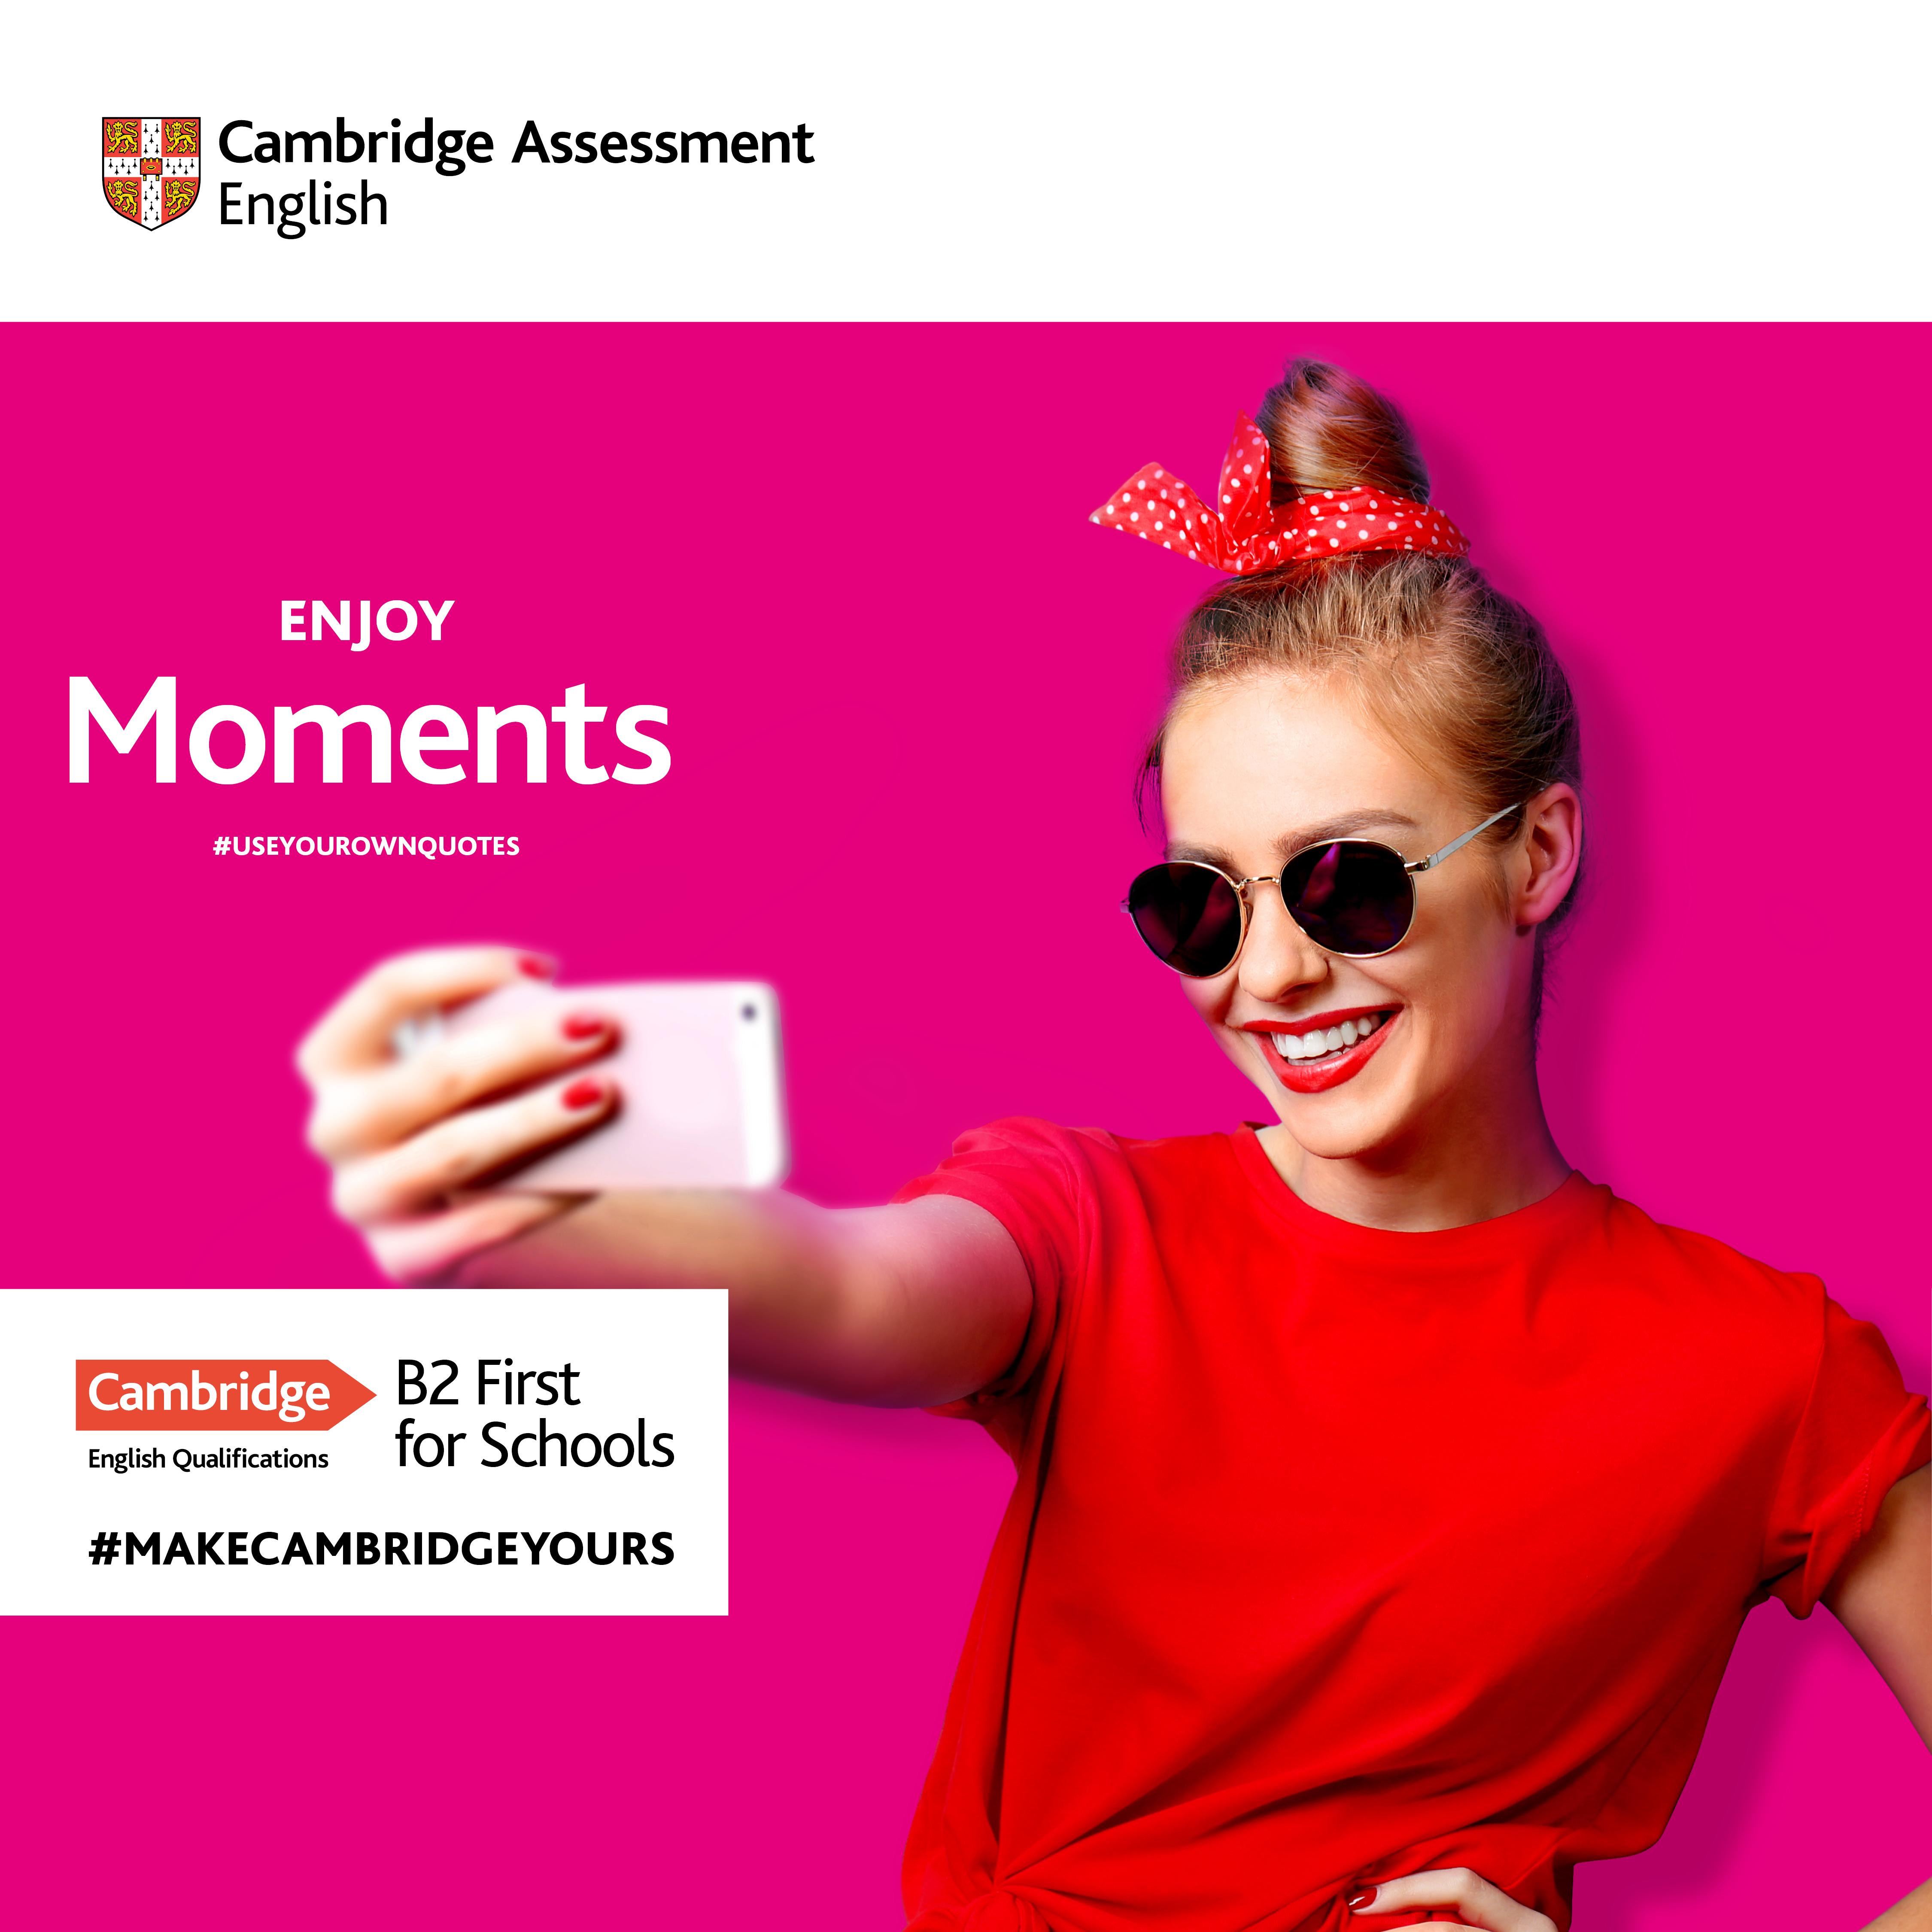 Cambridge Assessment English